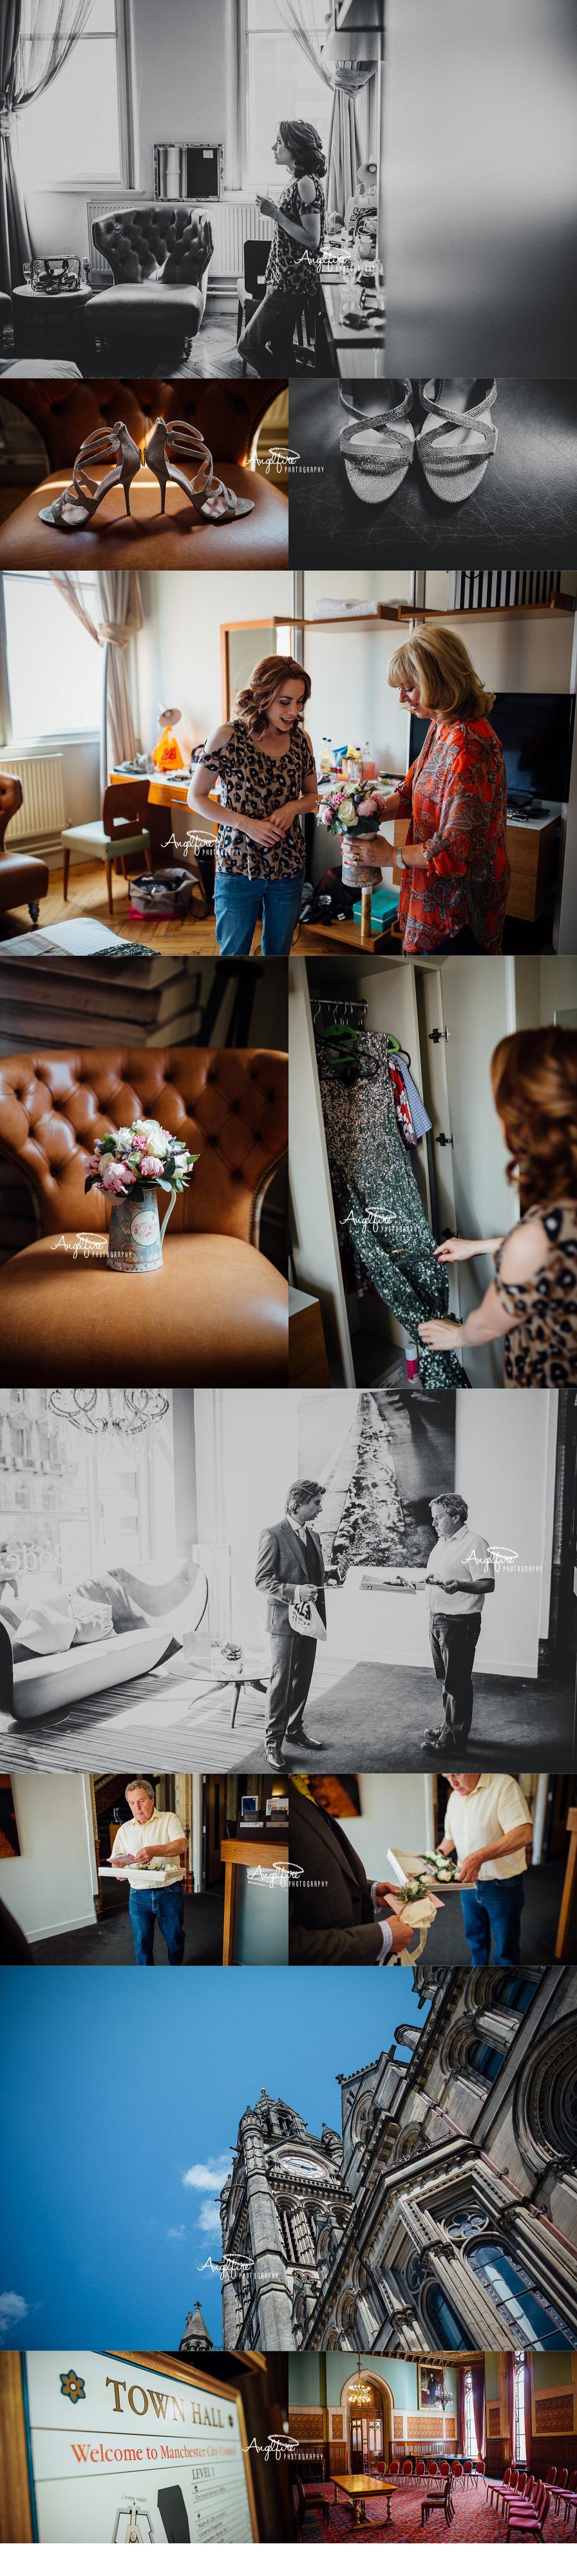 West Midlands Wedding Photographer | Angelfire Photography | www.angelfirephotography.co.uk1